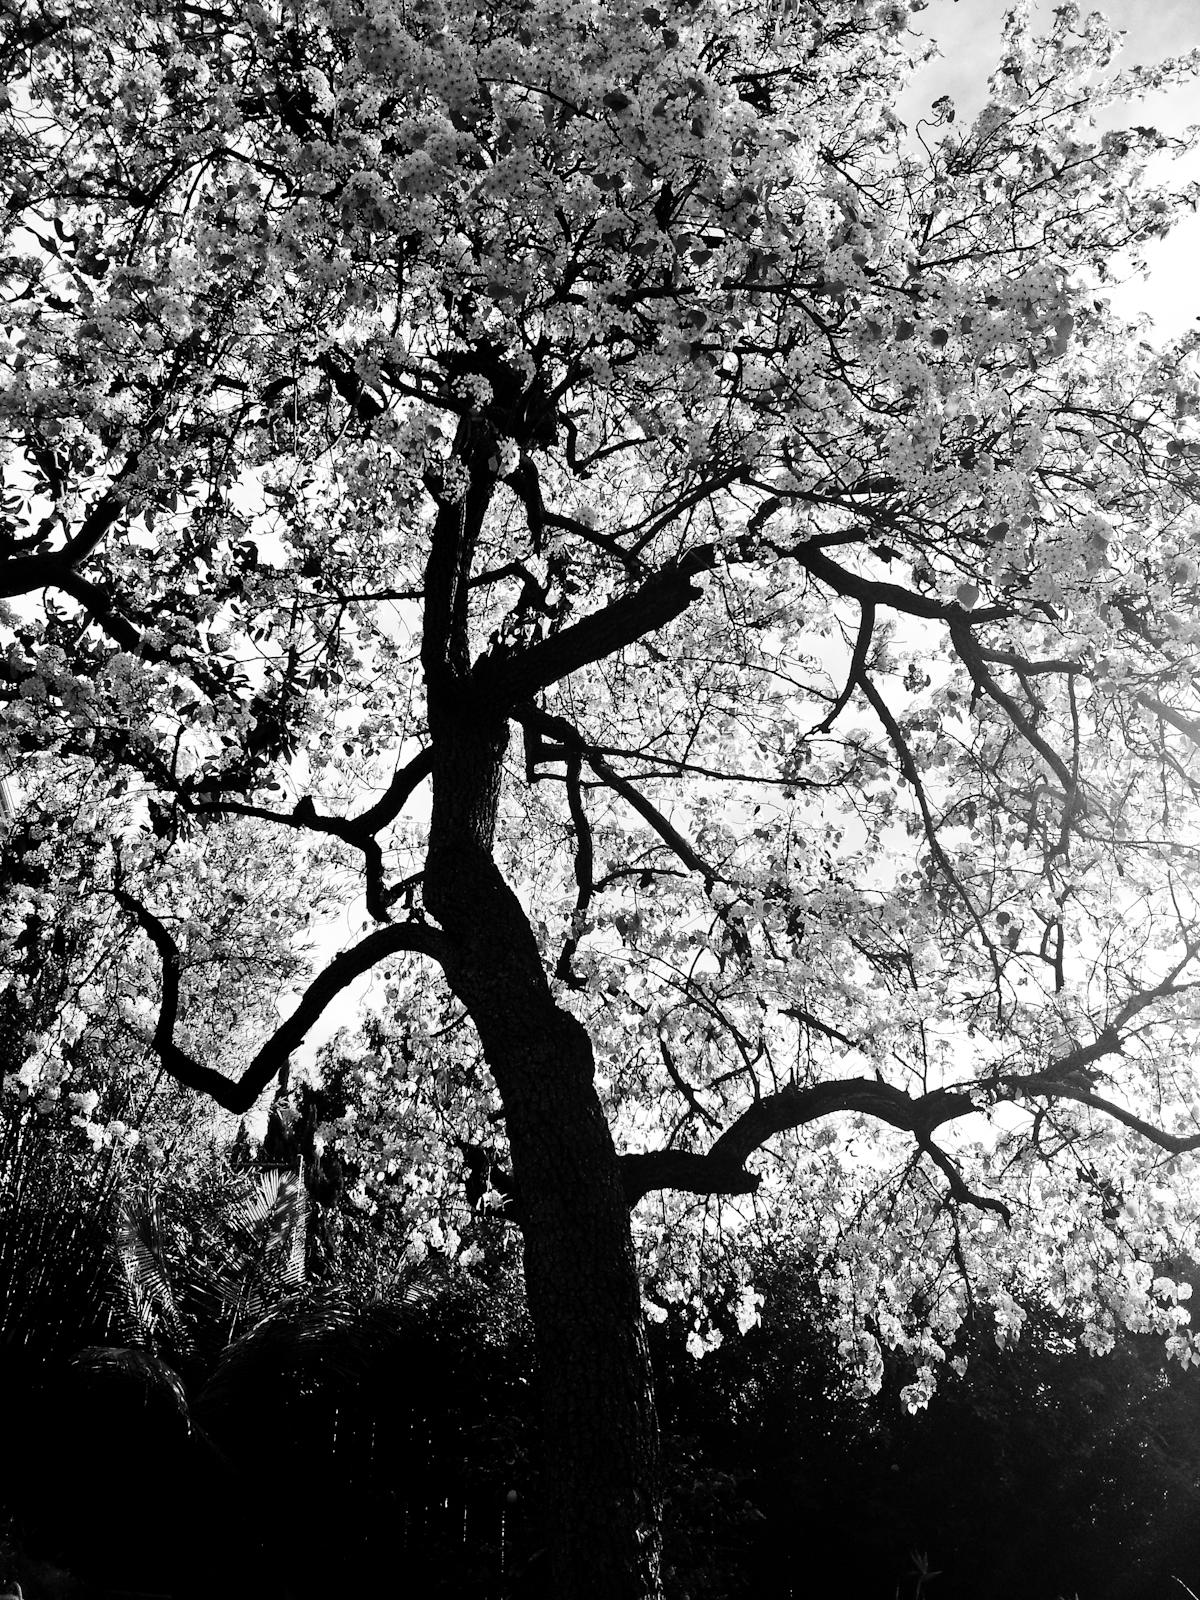 BW_Branches_Flowers.jpg